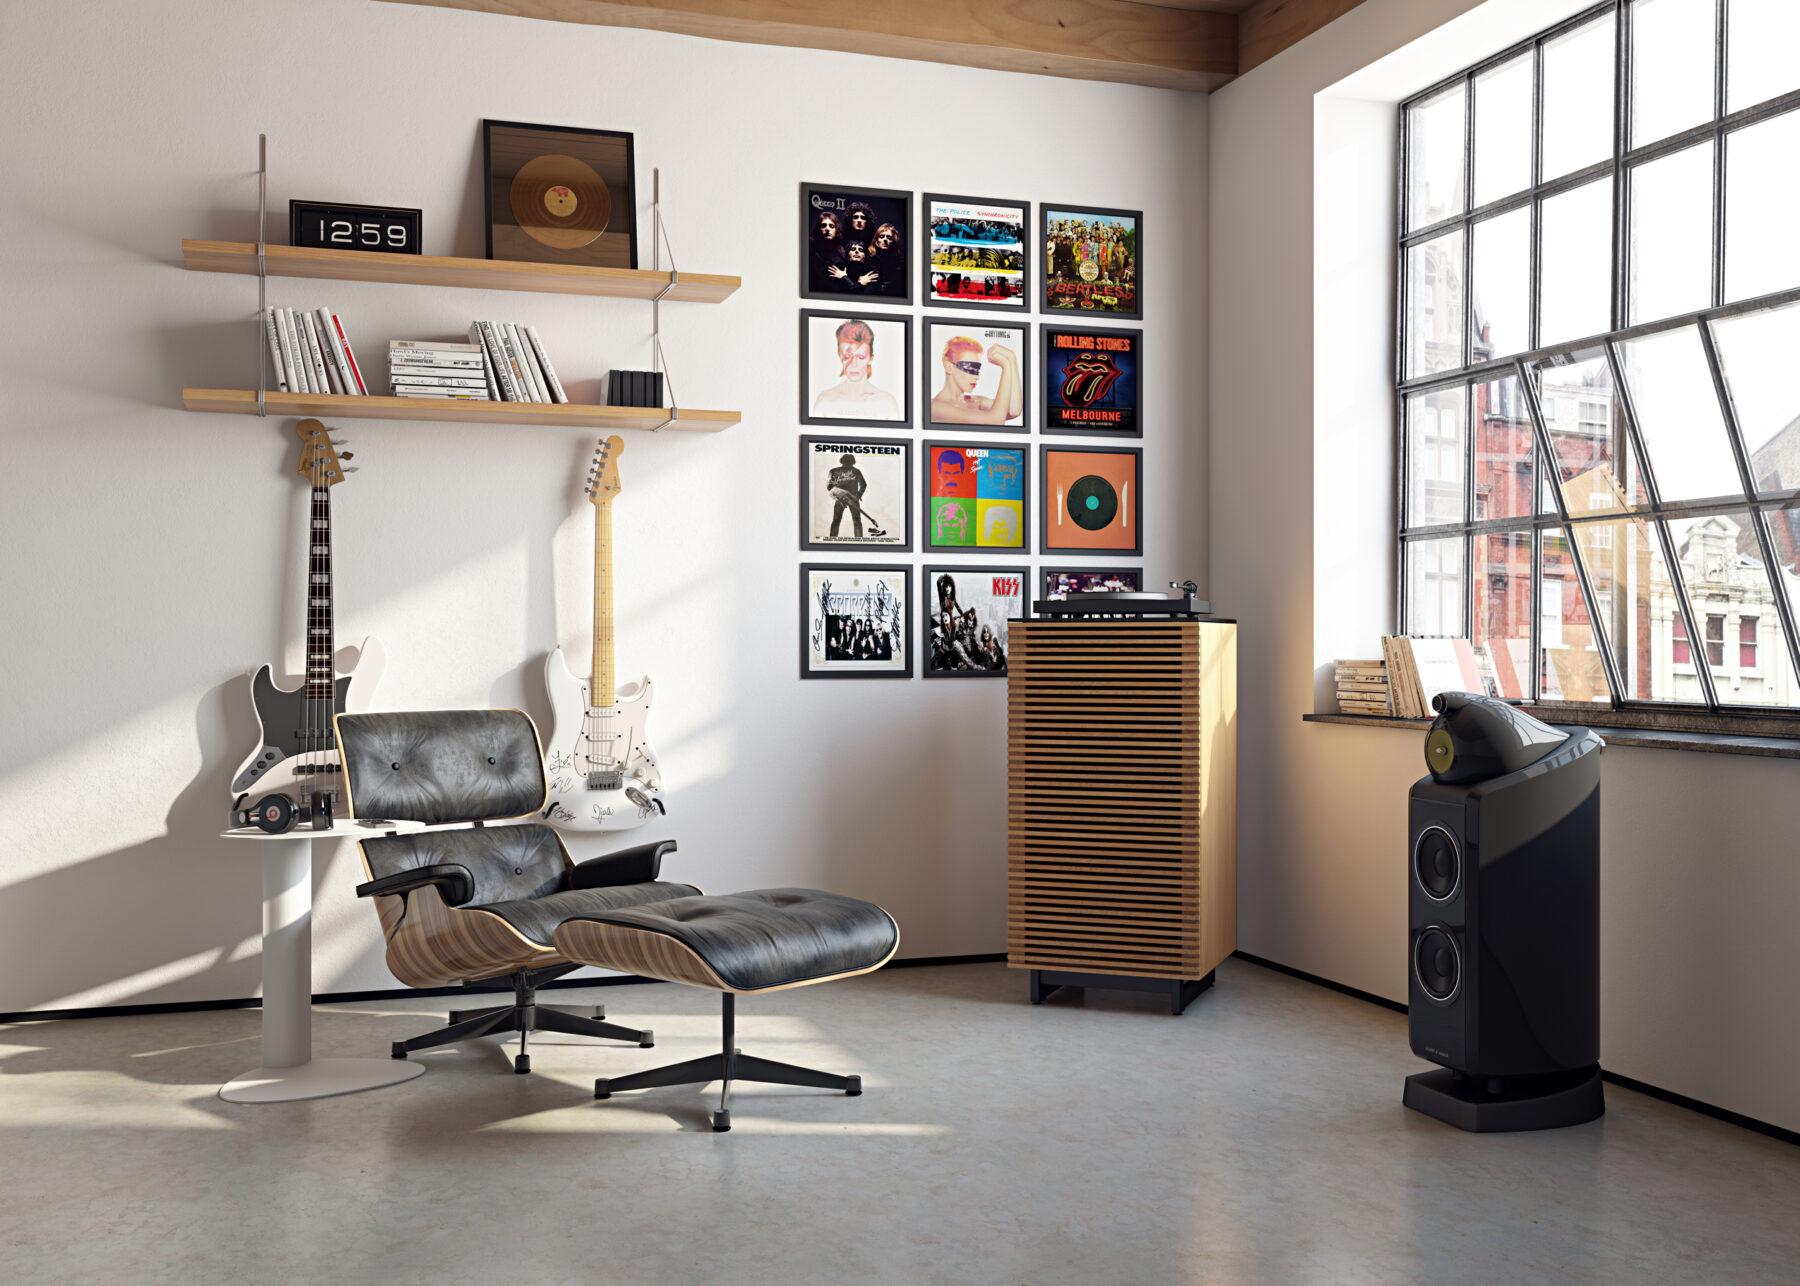 corridor-audio-tower-8172-BDI-wok-listening-room-setting